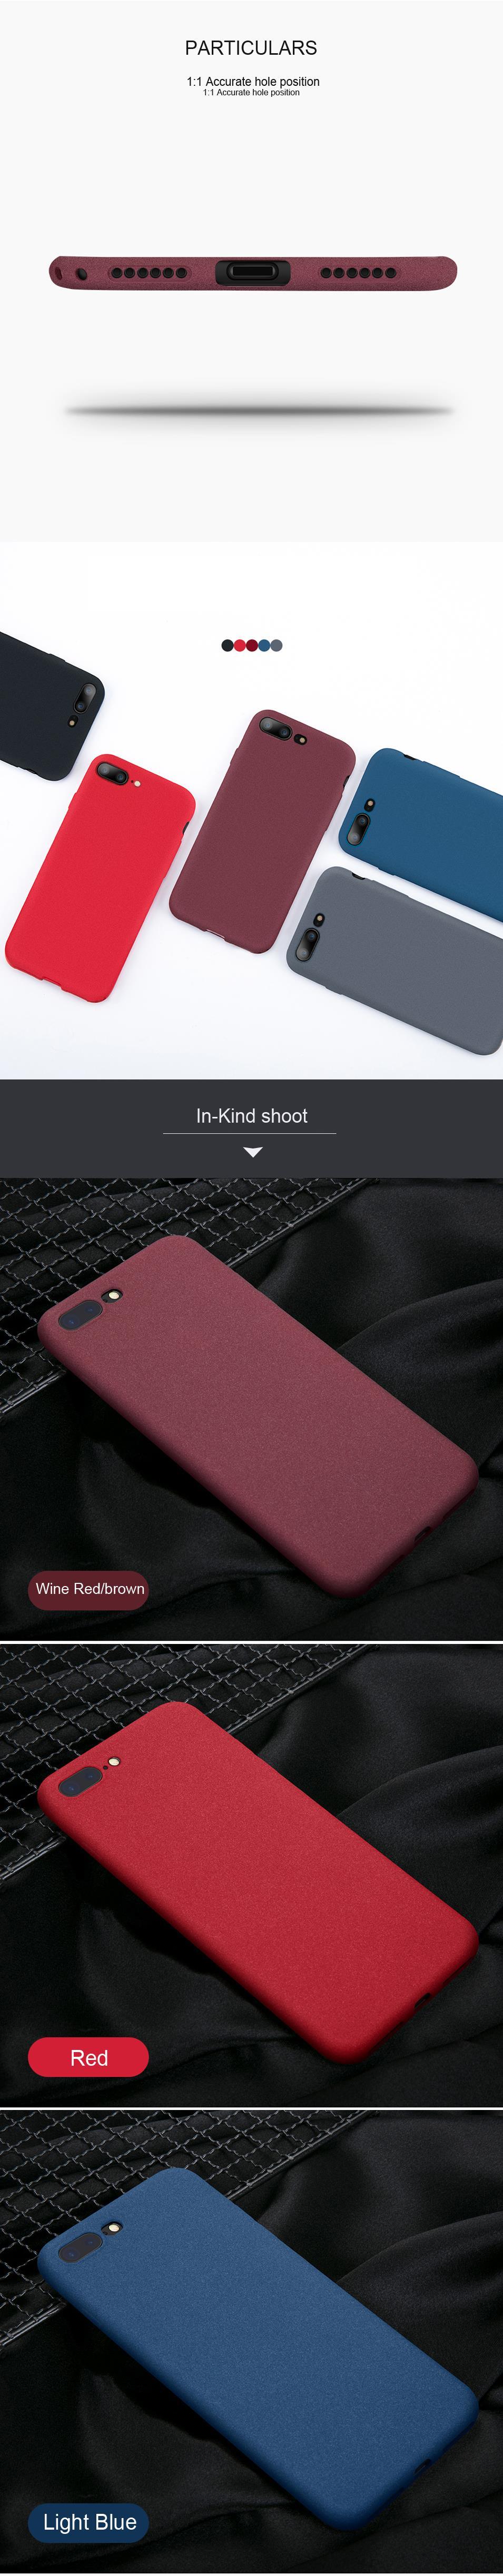 TPU Matte Fitted Case for Samsung Galaxy A3 A5 A7 J3 J5 J7 2016 2017 J3Pro J2 J5 J7 Prime Safety High Quality Soft Case Cover (14)